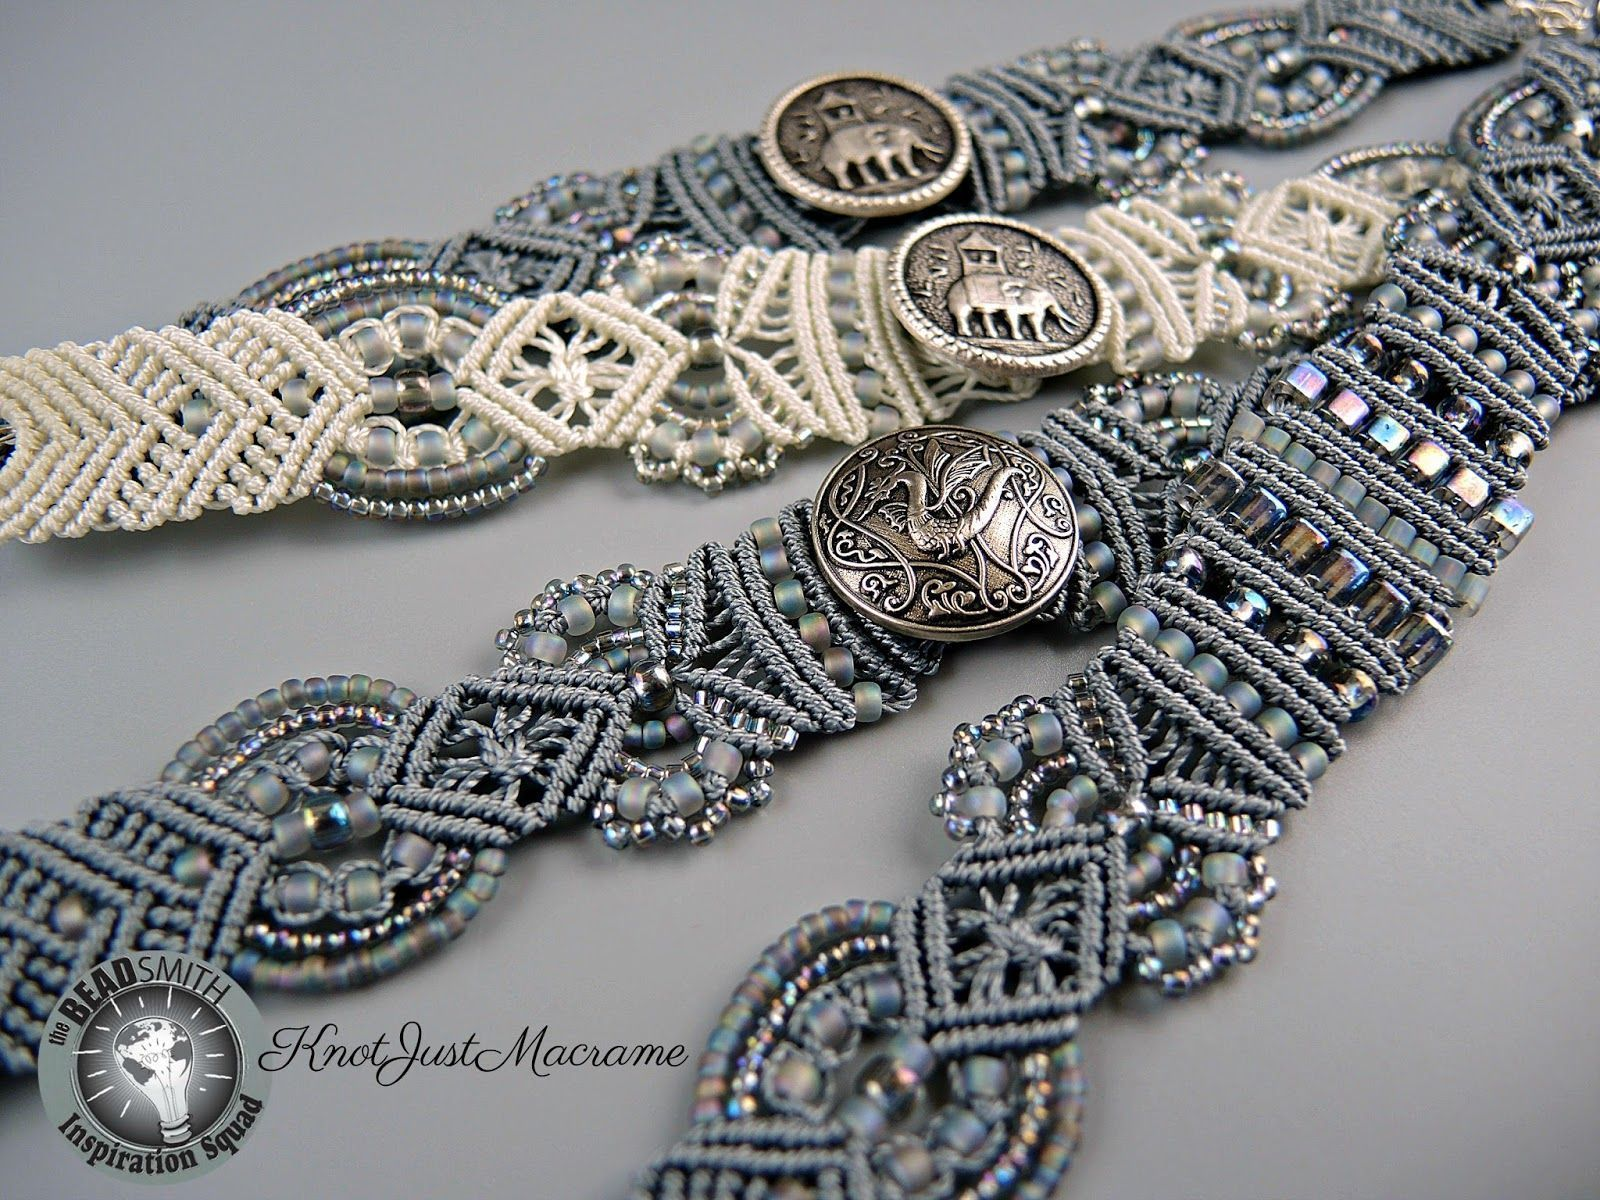 A blog by sherri stokey about handmade jewelry designs using micro